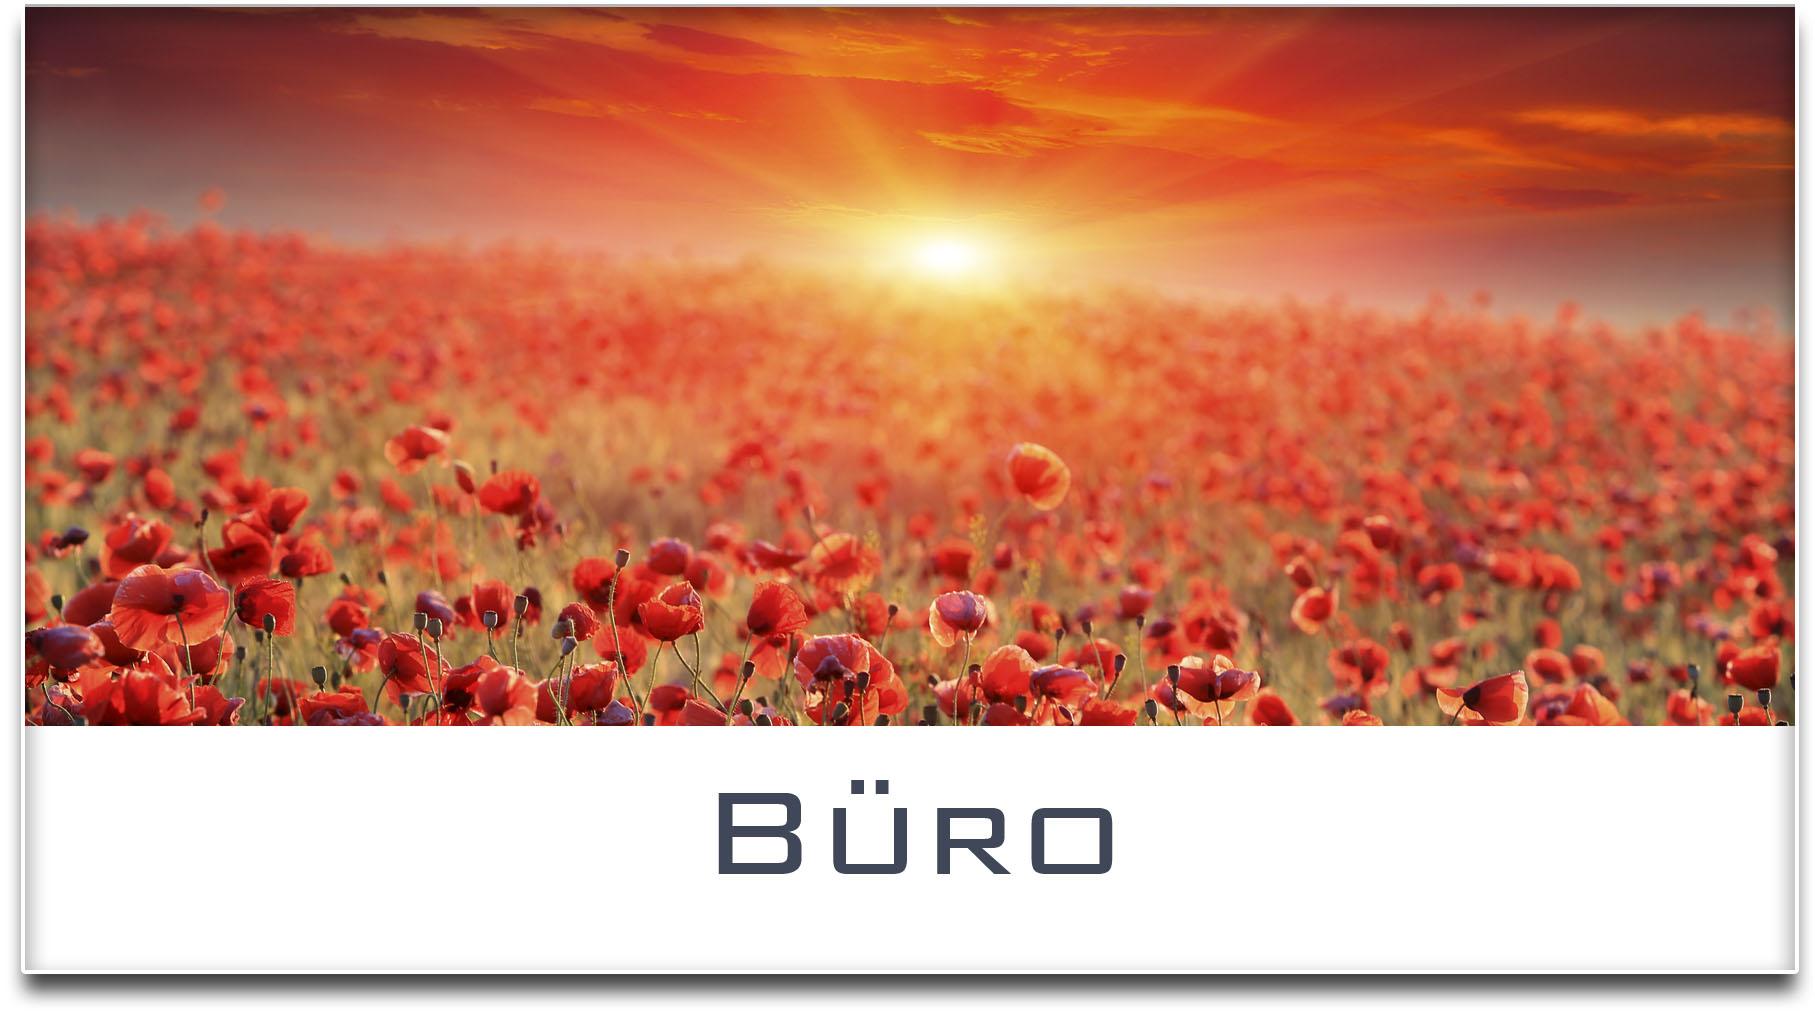 Türschild / Haustürschild / Mohnfeld / Sonnenuntergang / Büro / Selbstklebend